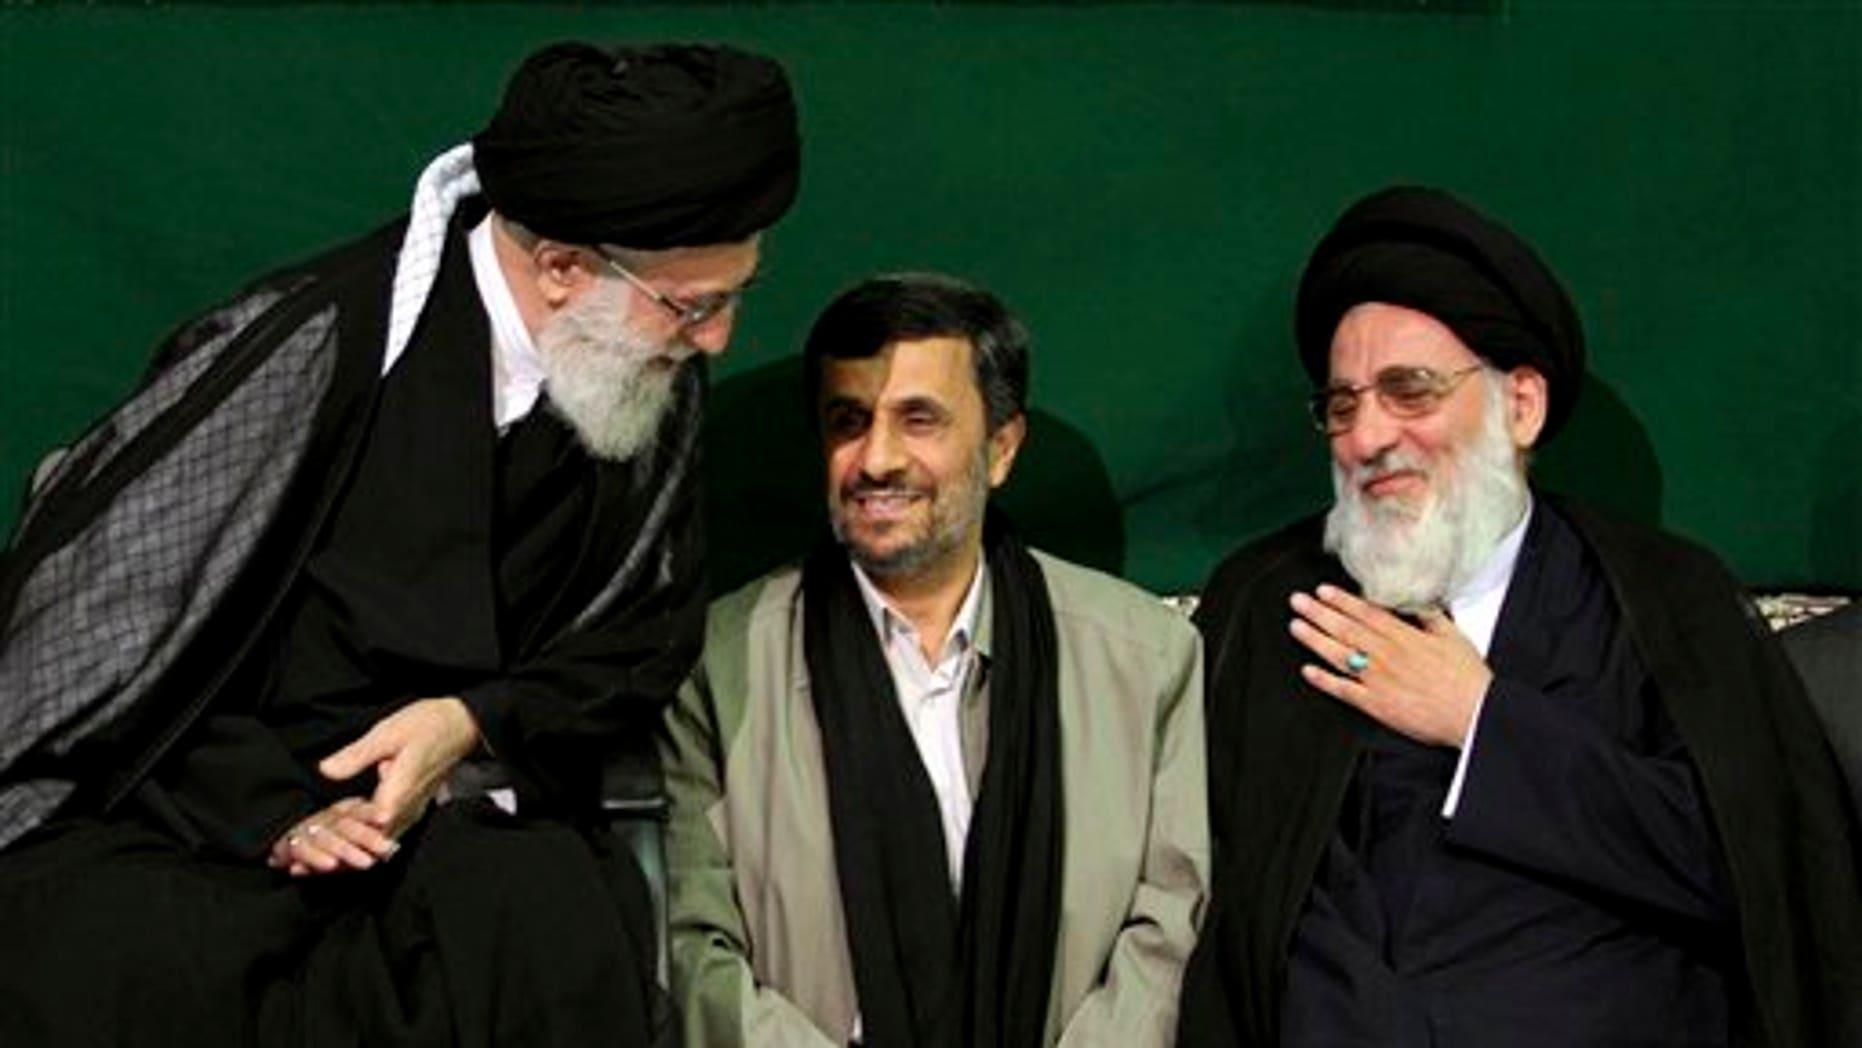 May 7, 2011: Iranian supreme leader Ayatollah Ali Khamenei, left, greets former Judiciary chief Ayatollah Mahmoud Hashemi Shahroudi, right, as President Mahmoud Ahmadinejad sits at center, during a religious ceremony, in Tehran, Iran.